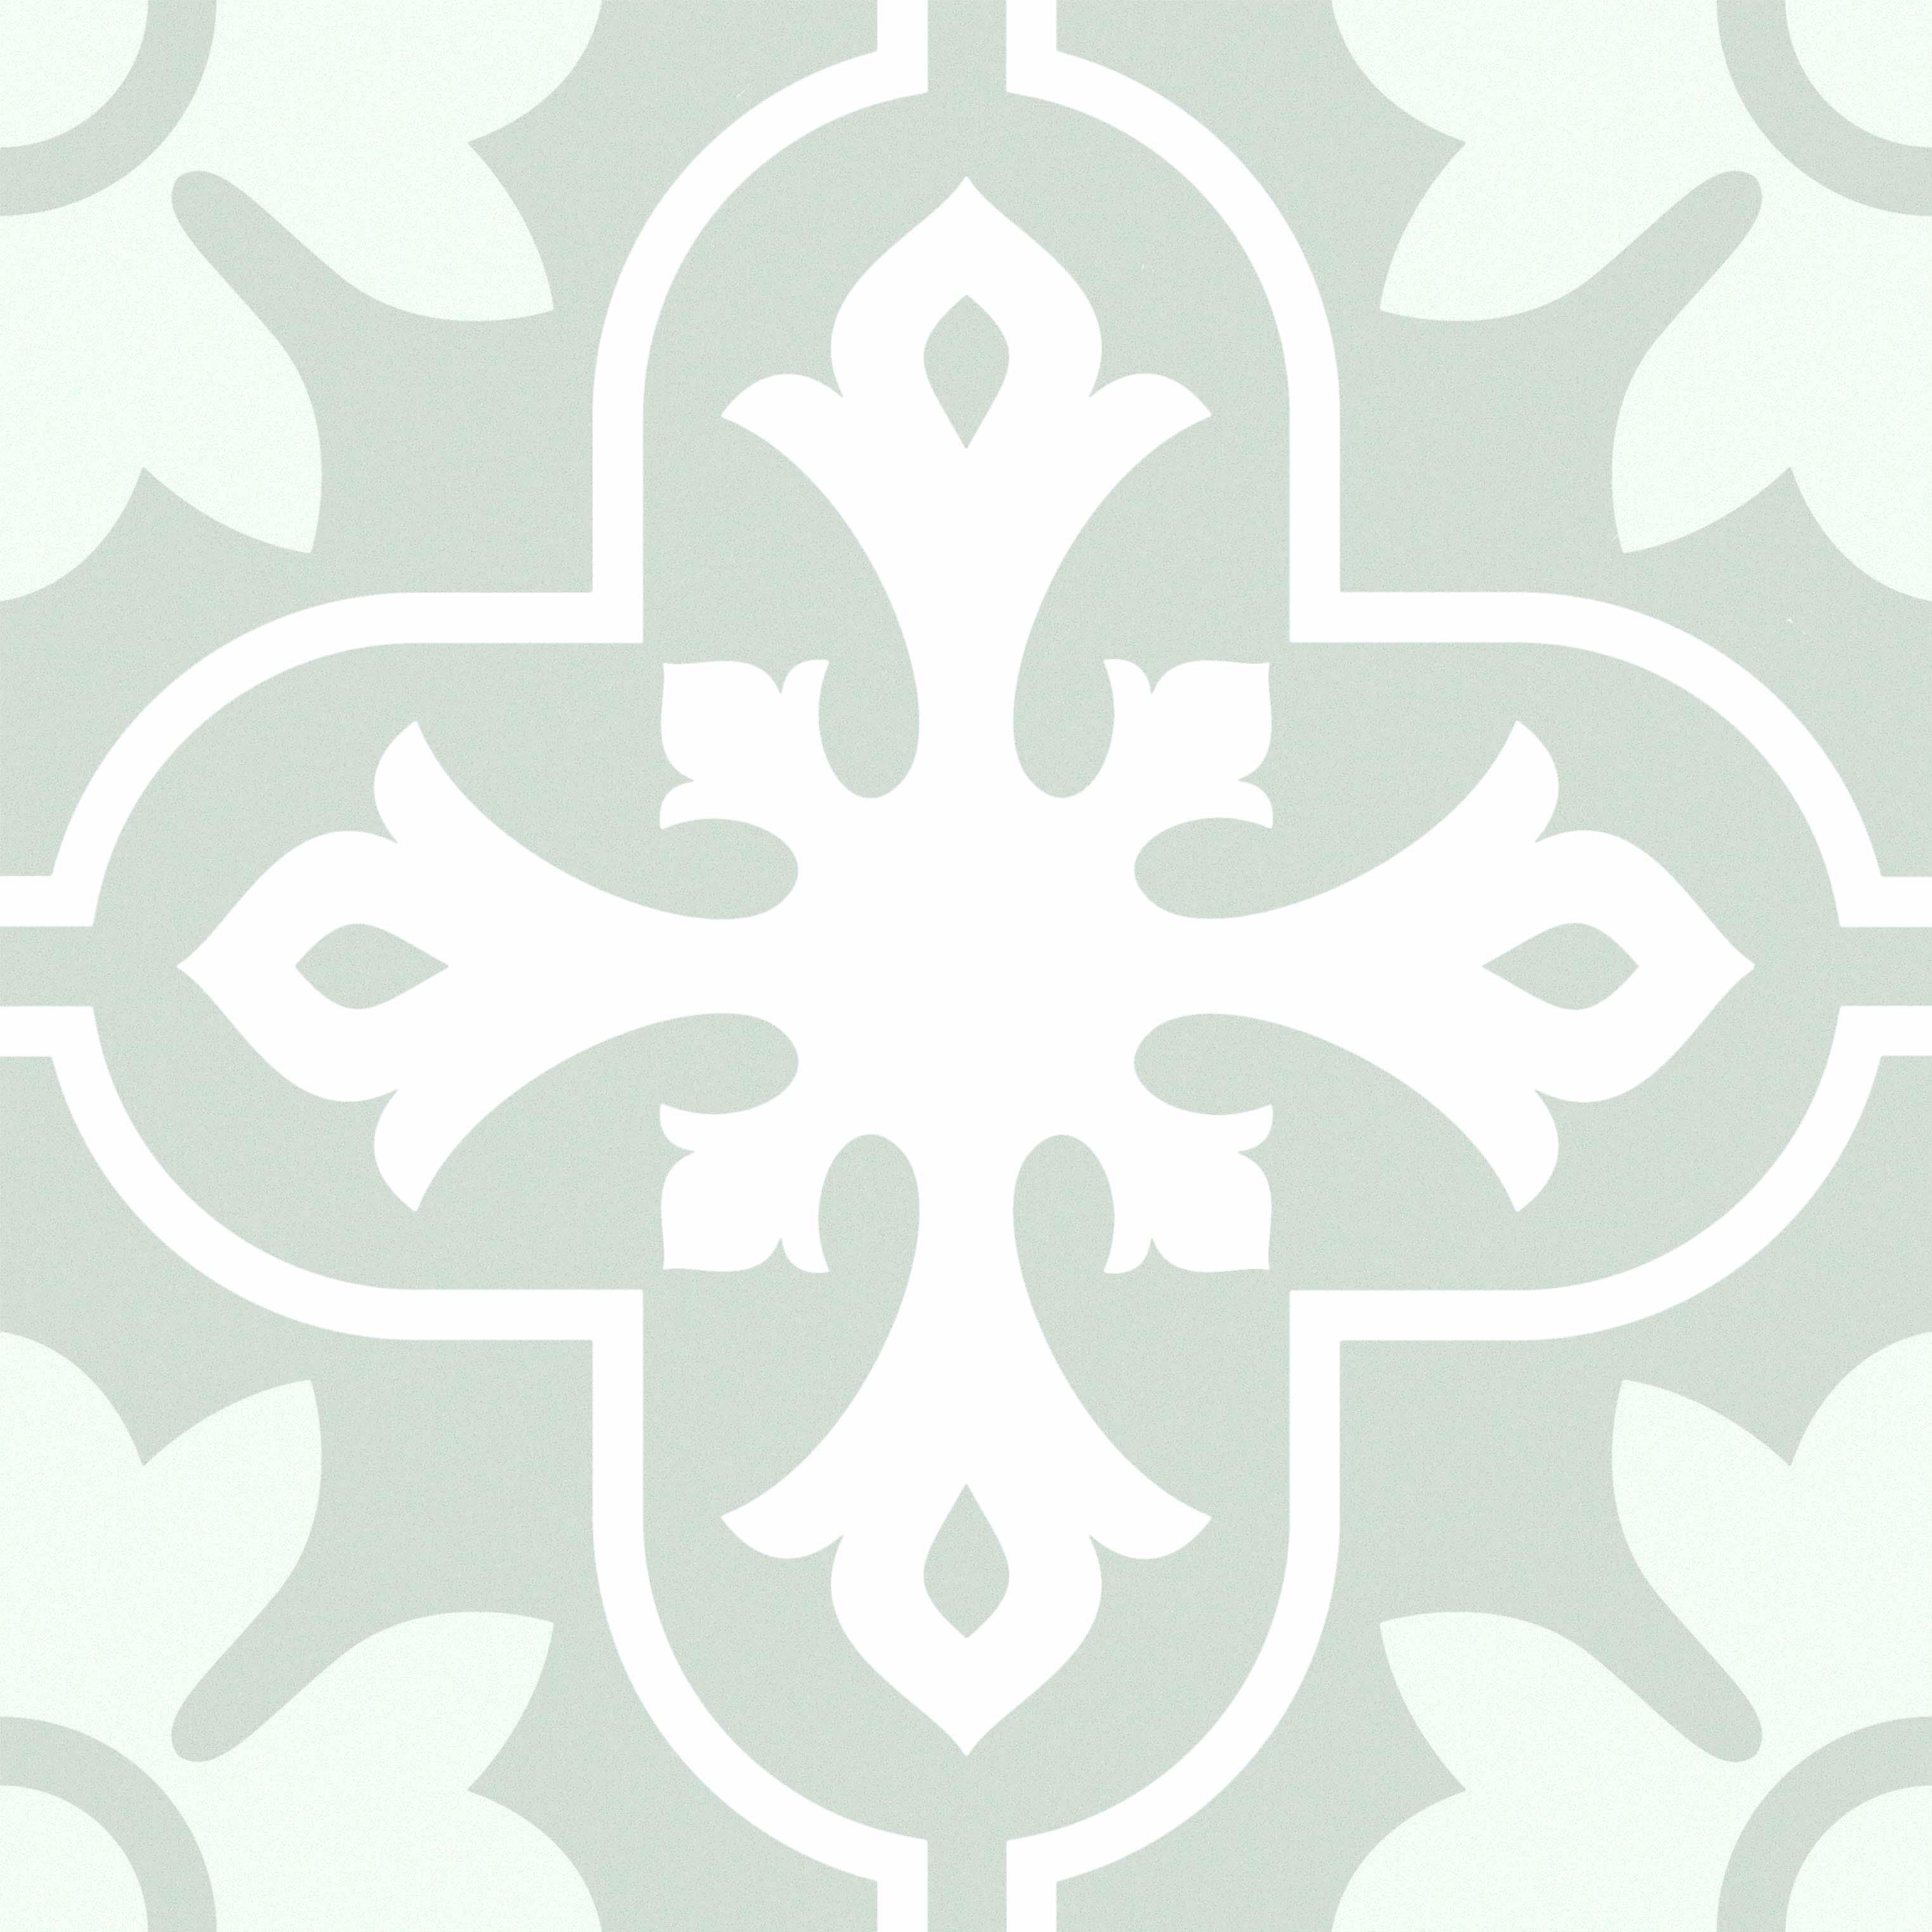 Marseille - St Julien Silver Lion Trading Marseille Patterned porcelain